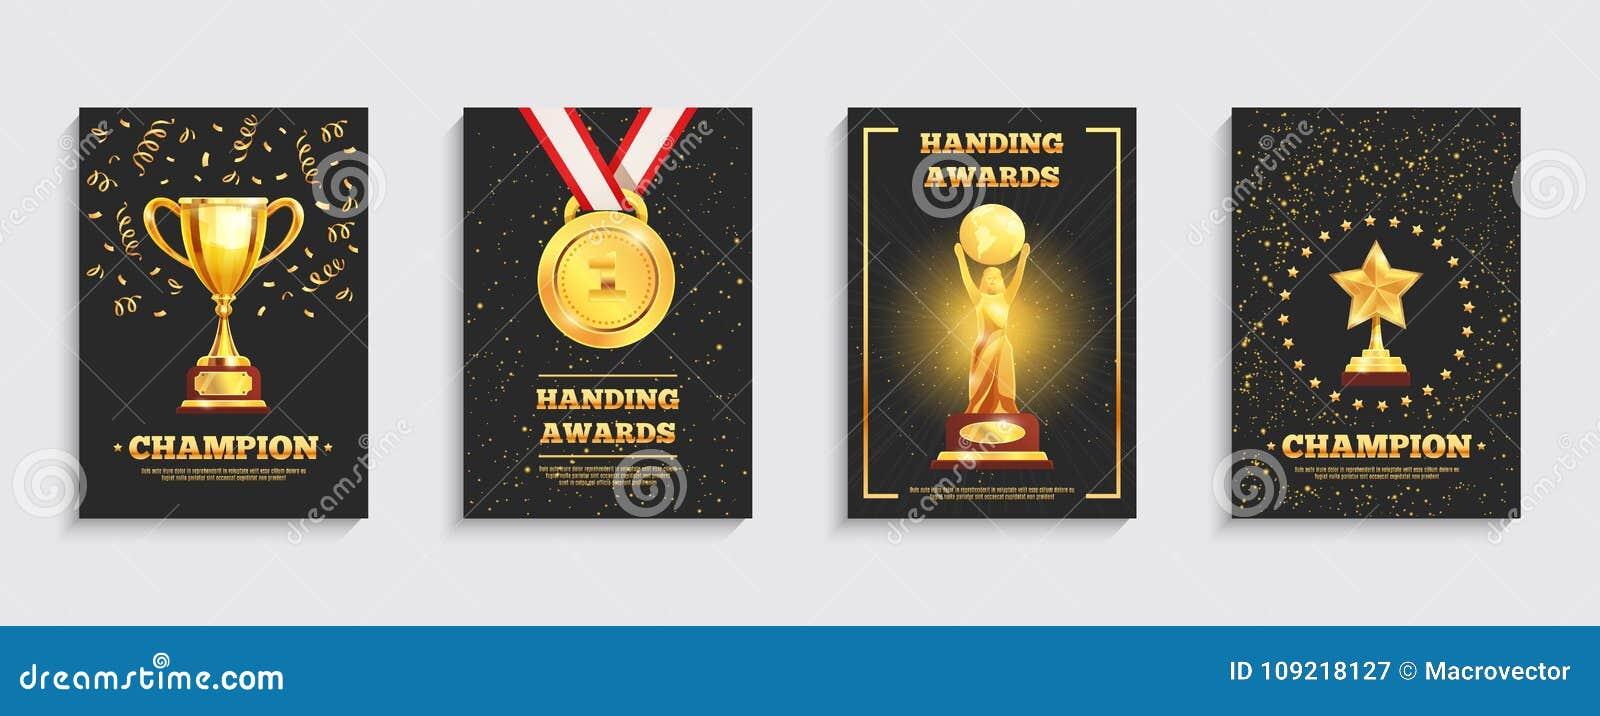 Award Gold Trophy Posters Set Stock Vector Illustration Of Dark